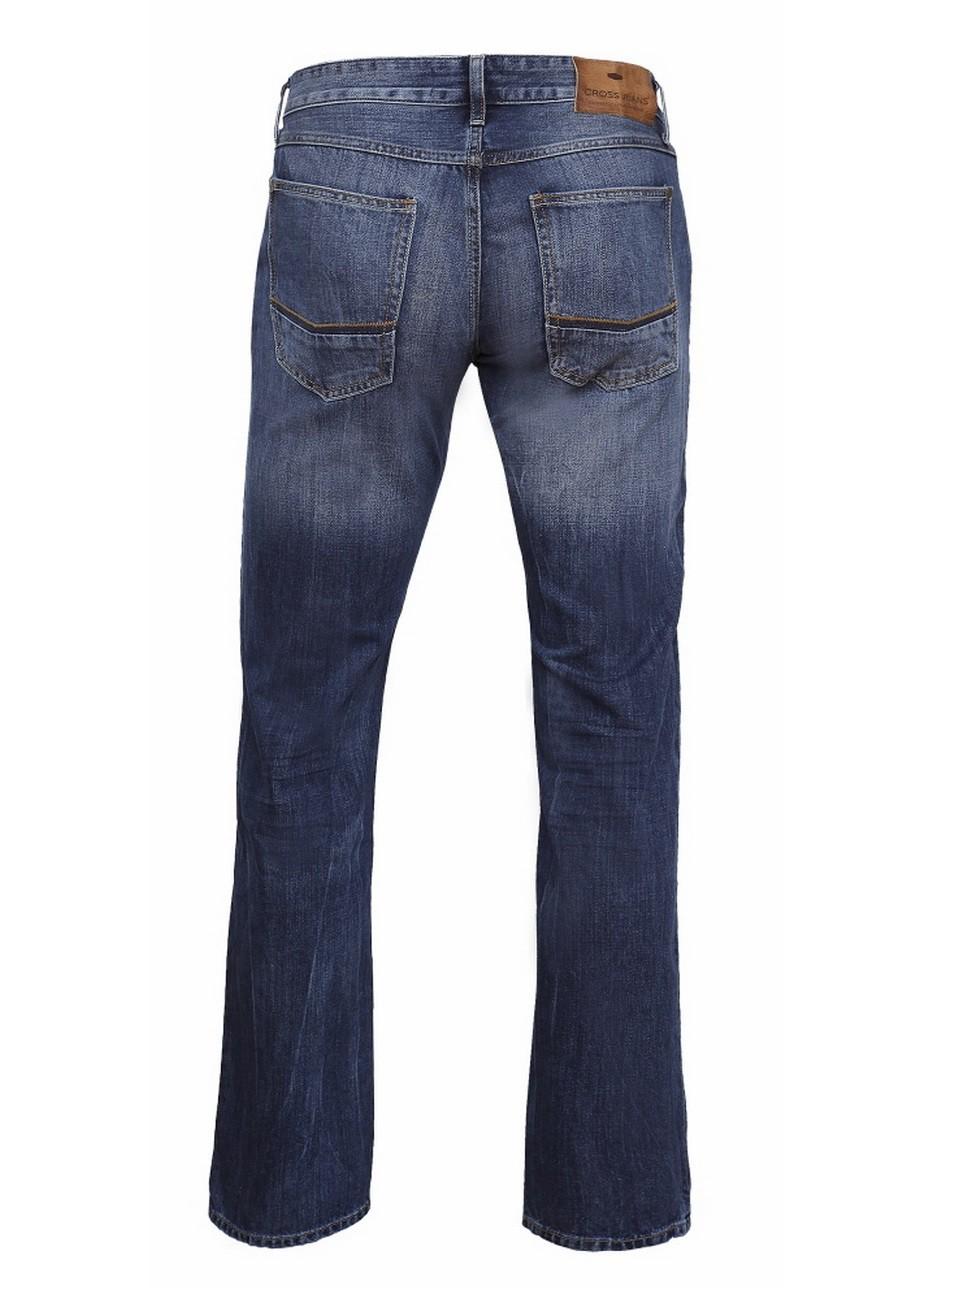 Cross Jeans Herren Jeans Antonio - Relax Fit - Deep Blue Worn Out